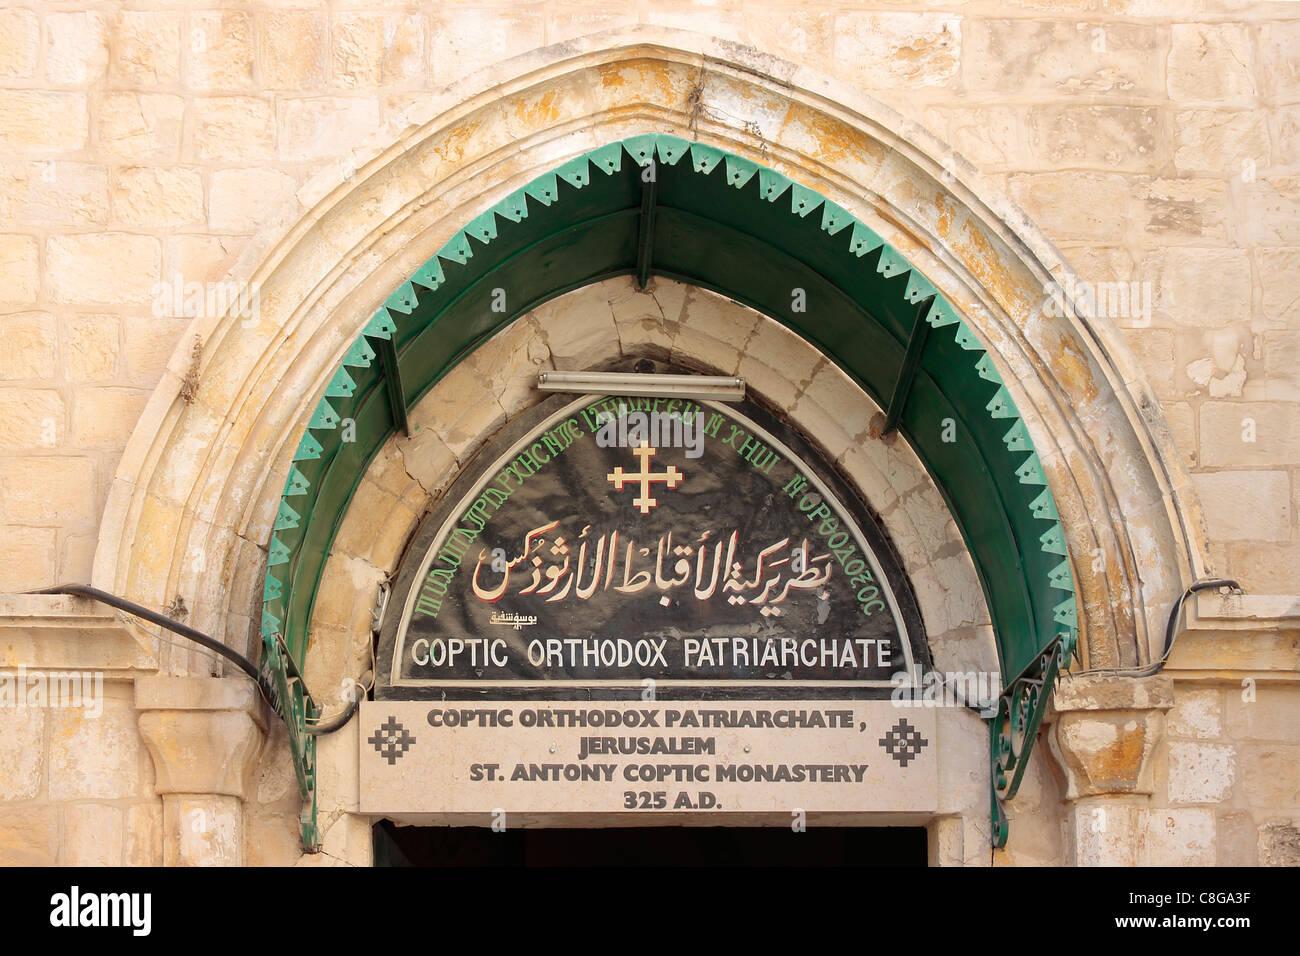 Coptic Orthodox Patriarchate Church - Station 9, Jerusalem - Stock Image